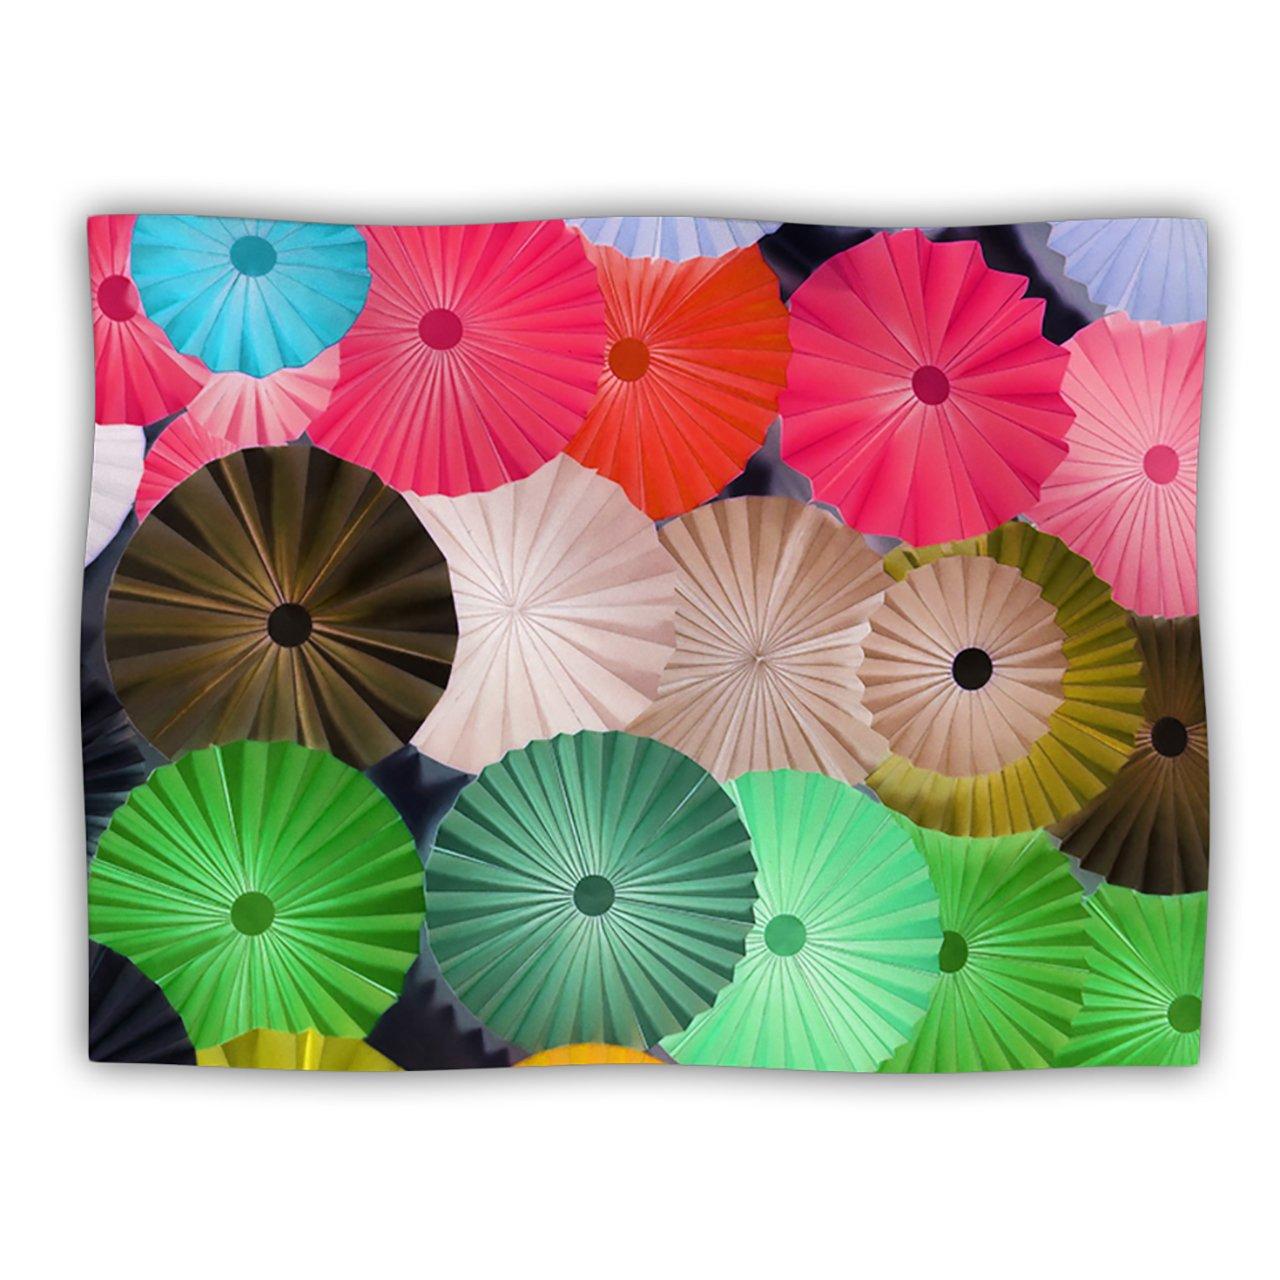 Kess InHouse Heidi Jennings Parasol Paper Circle Pet Blanket, 40 by 30-Inch